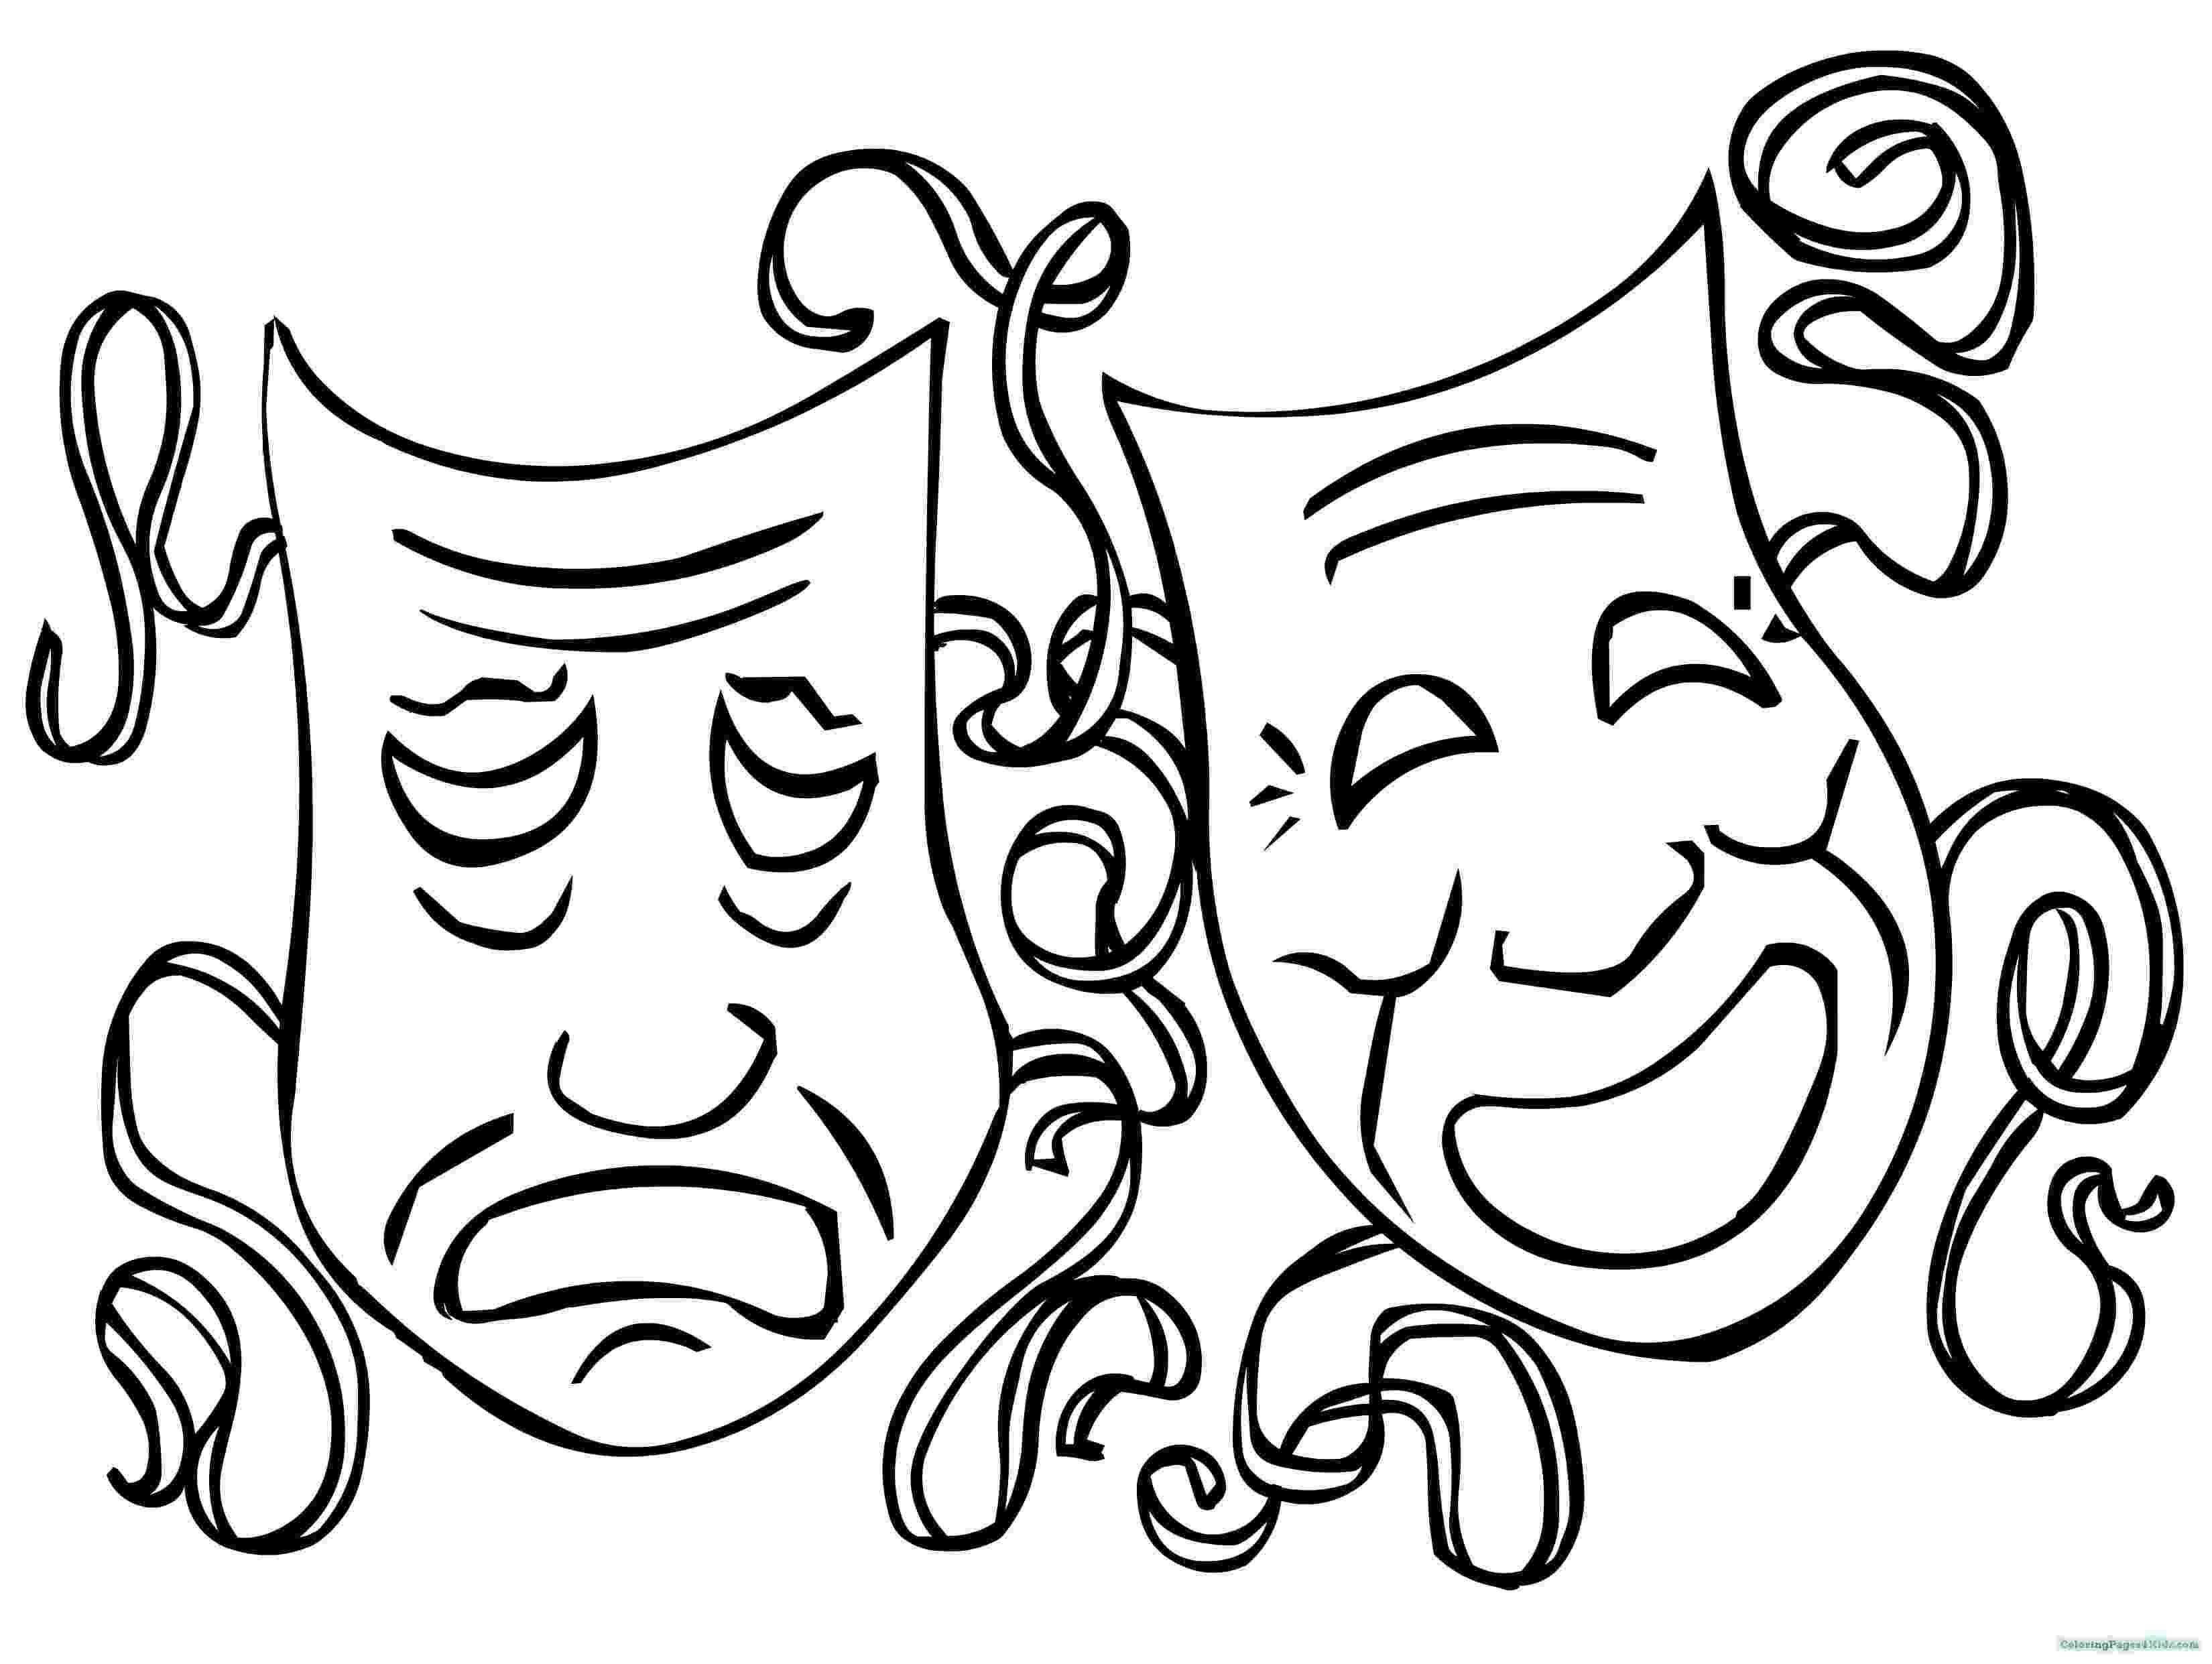 mardi gras mask coloring sheet printable mardi gras coloring pages kids coloring pages sheet mardi coloring gras mask